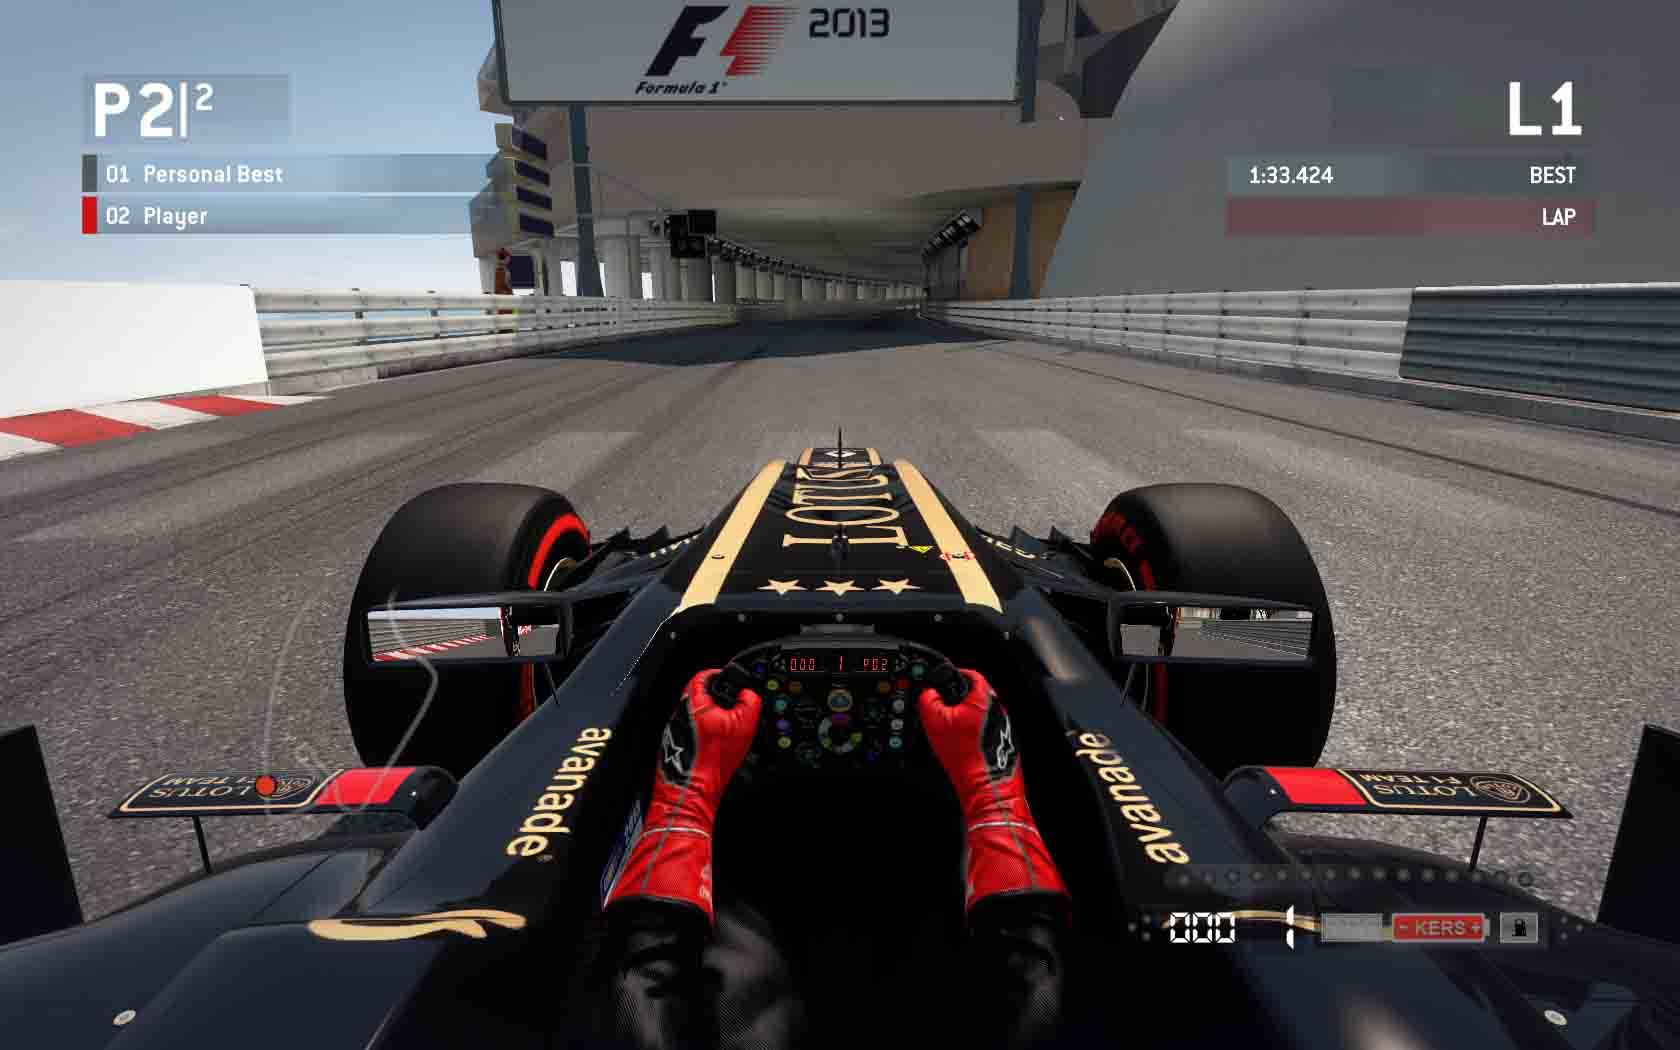 F1_2013 2013-11-05 00-06-31-74 copy.jpg